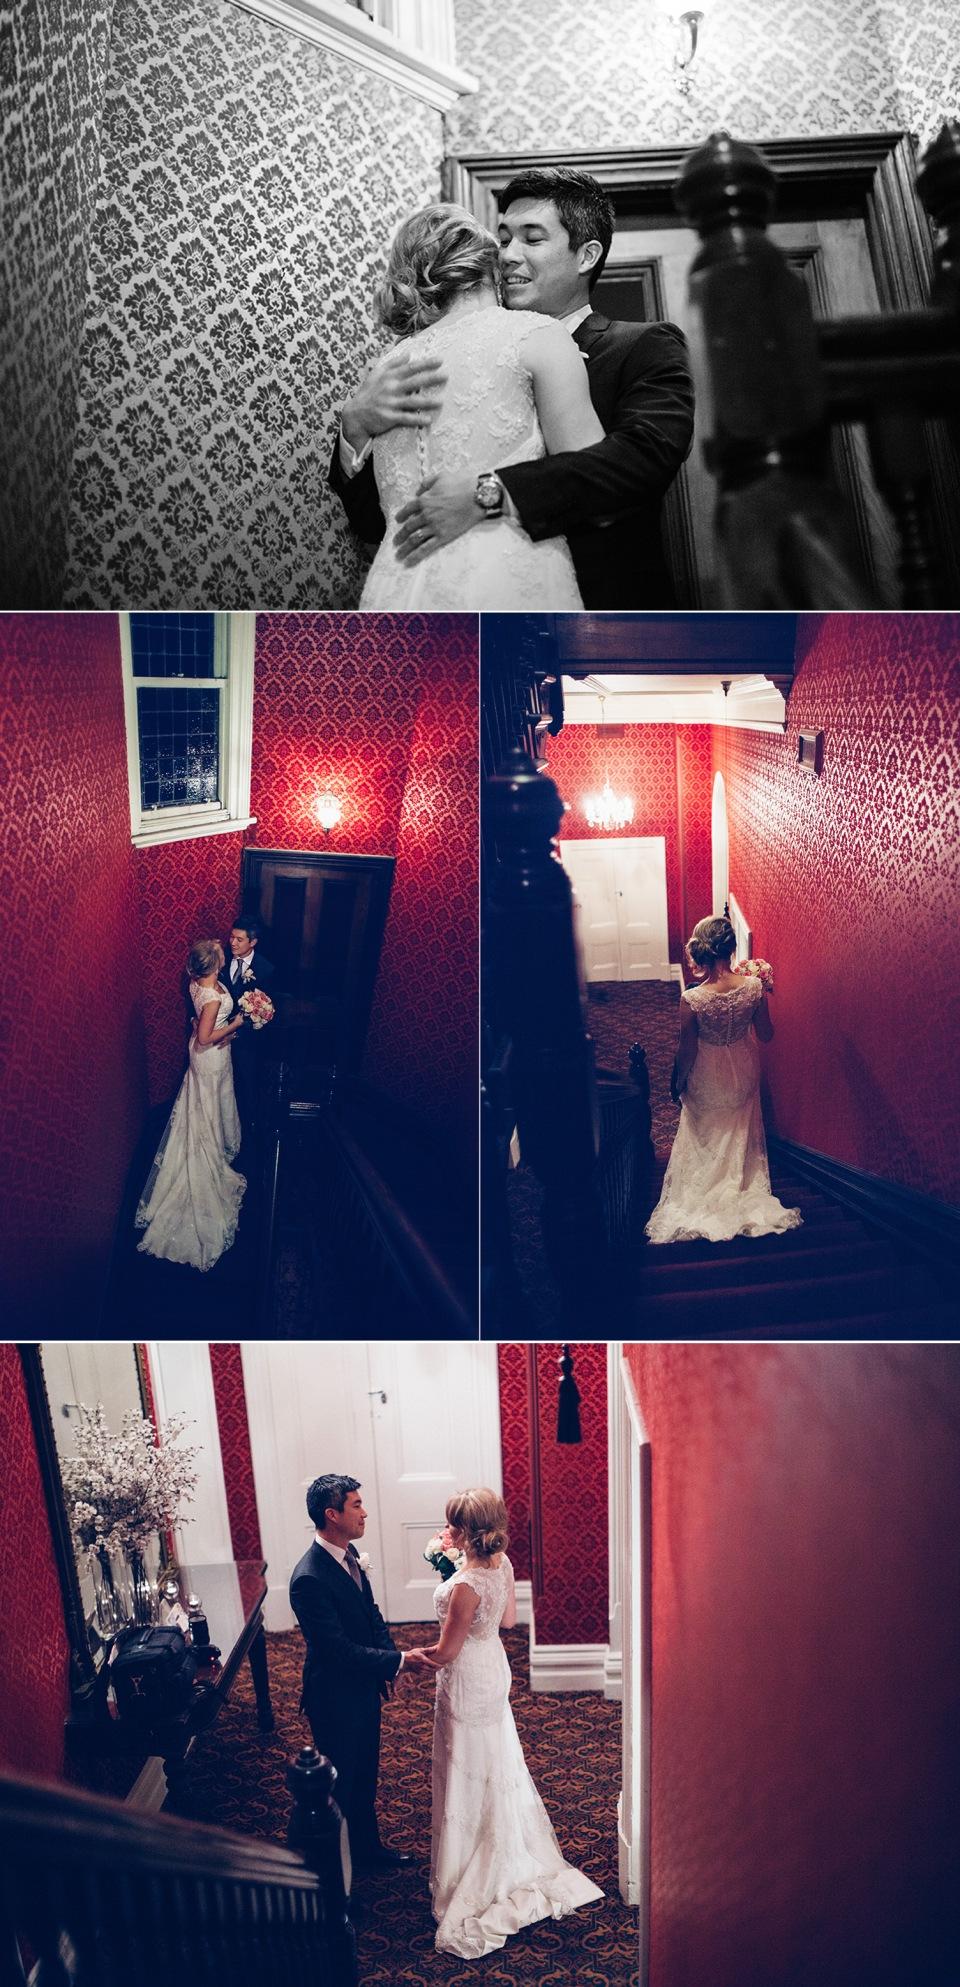 The Gables Wedding photography